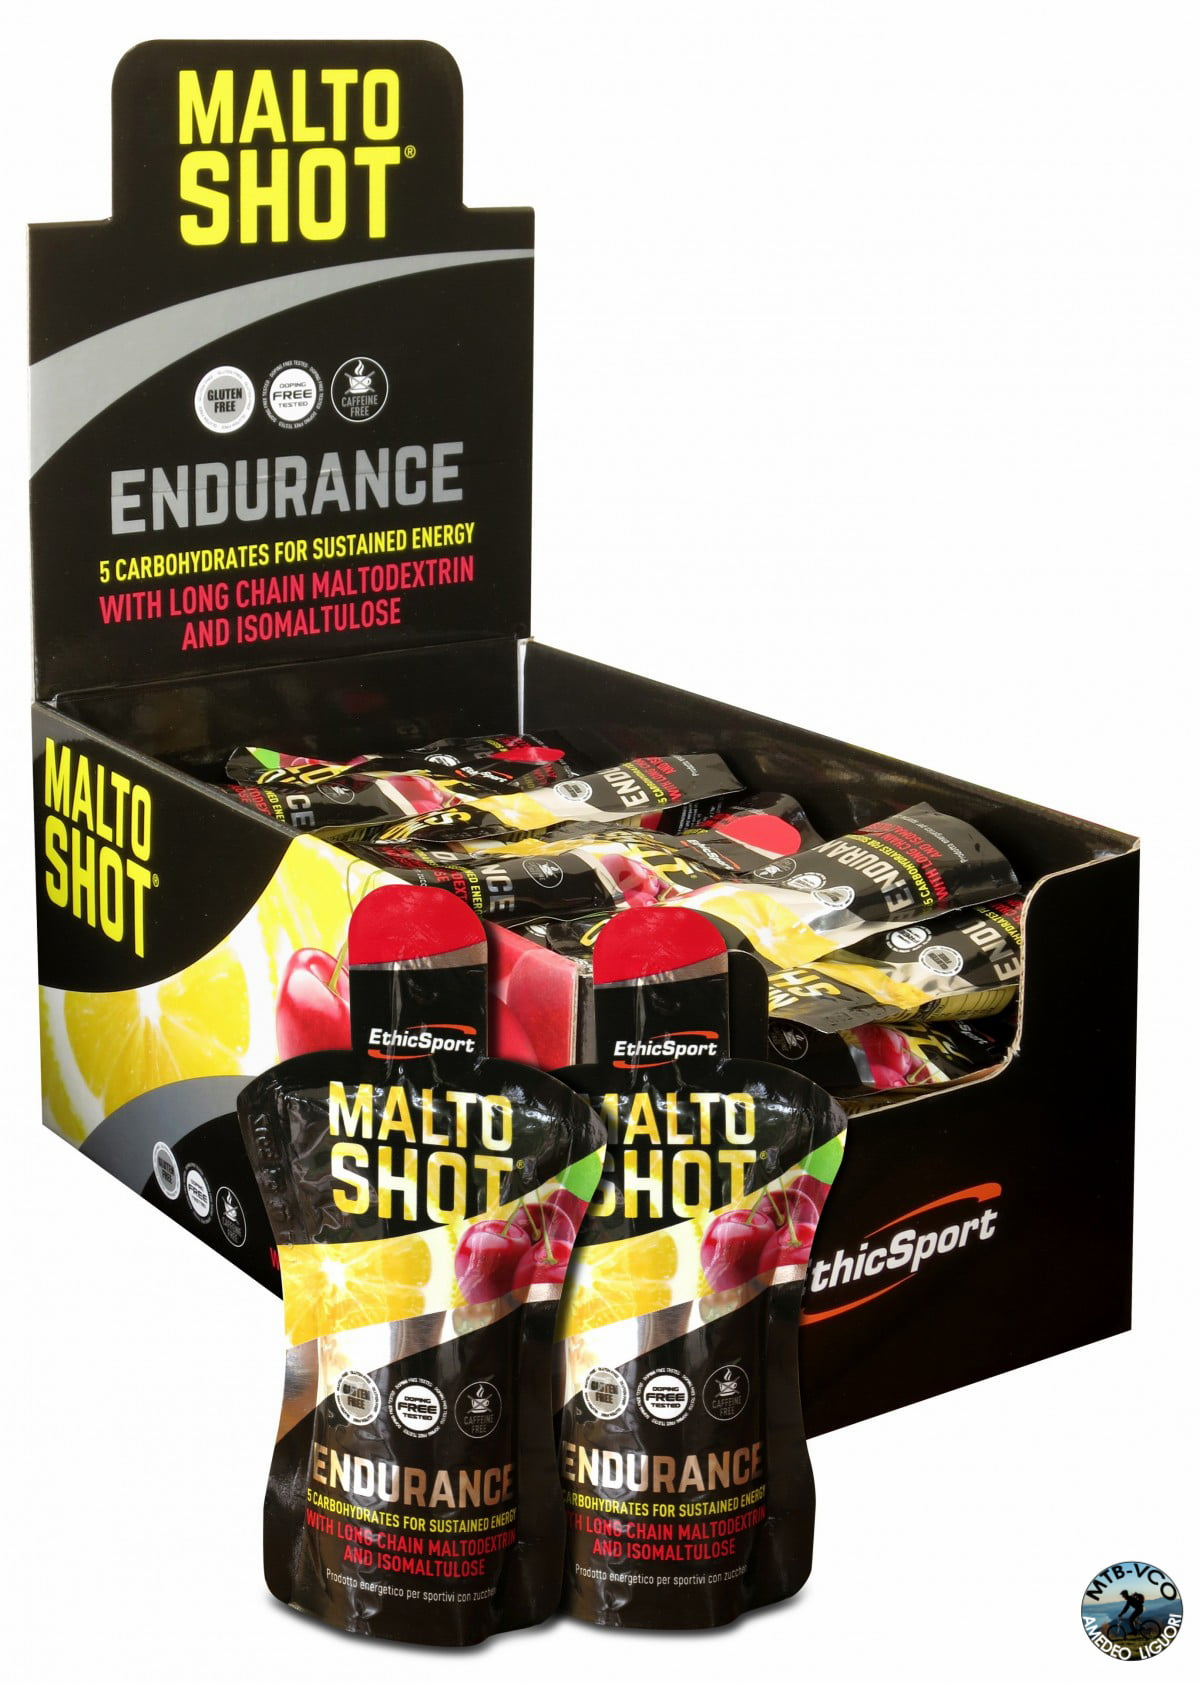 img_503295_155237MaltoShot-endurance